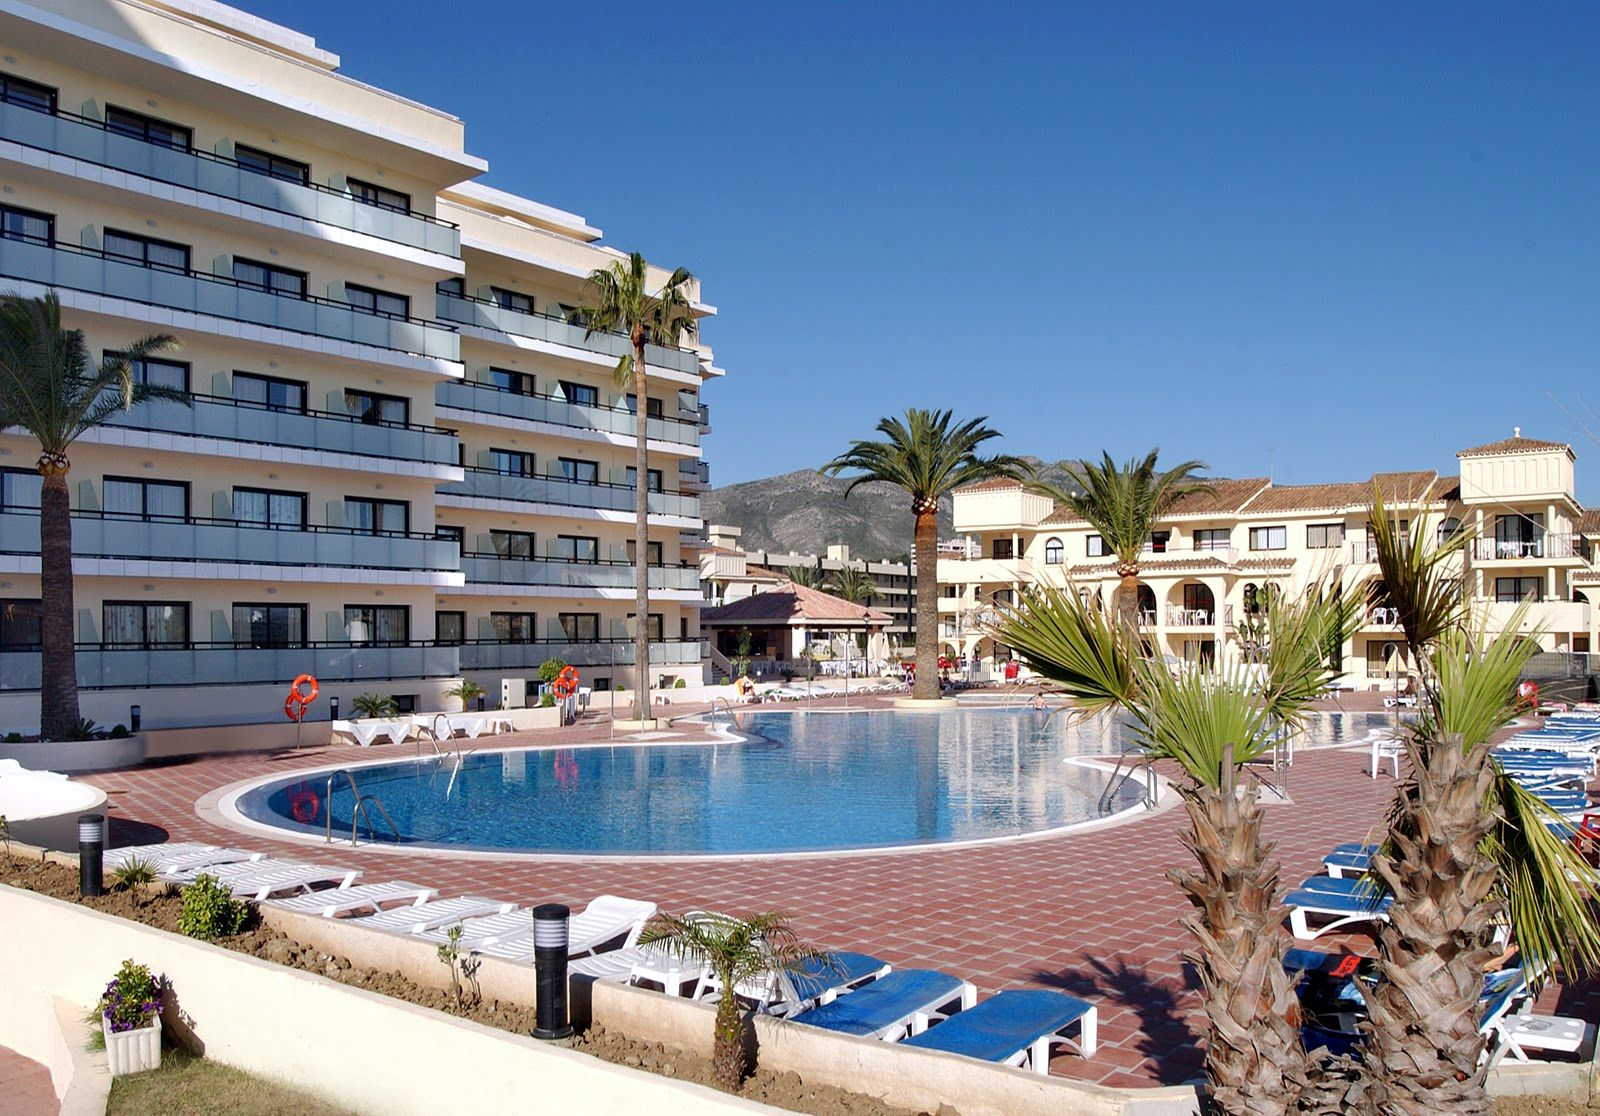 Hotel Club Camino Real Torremolinos Andalousie